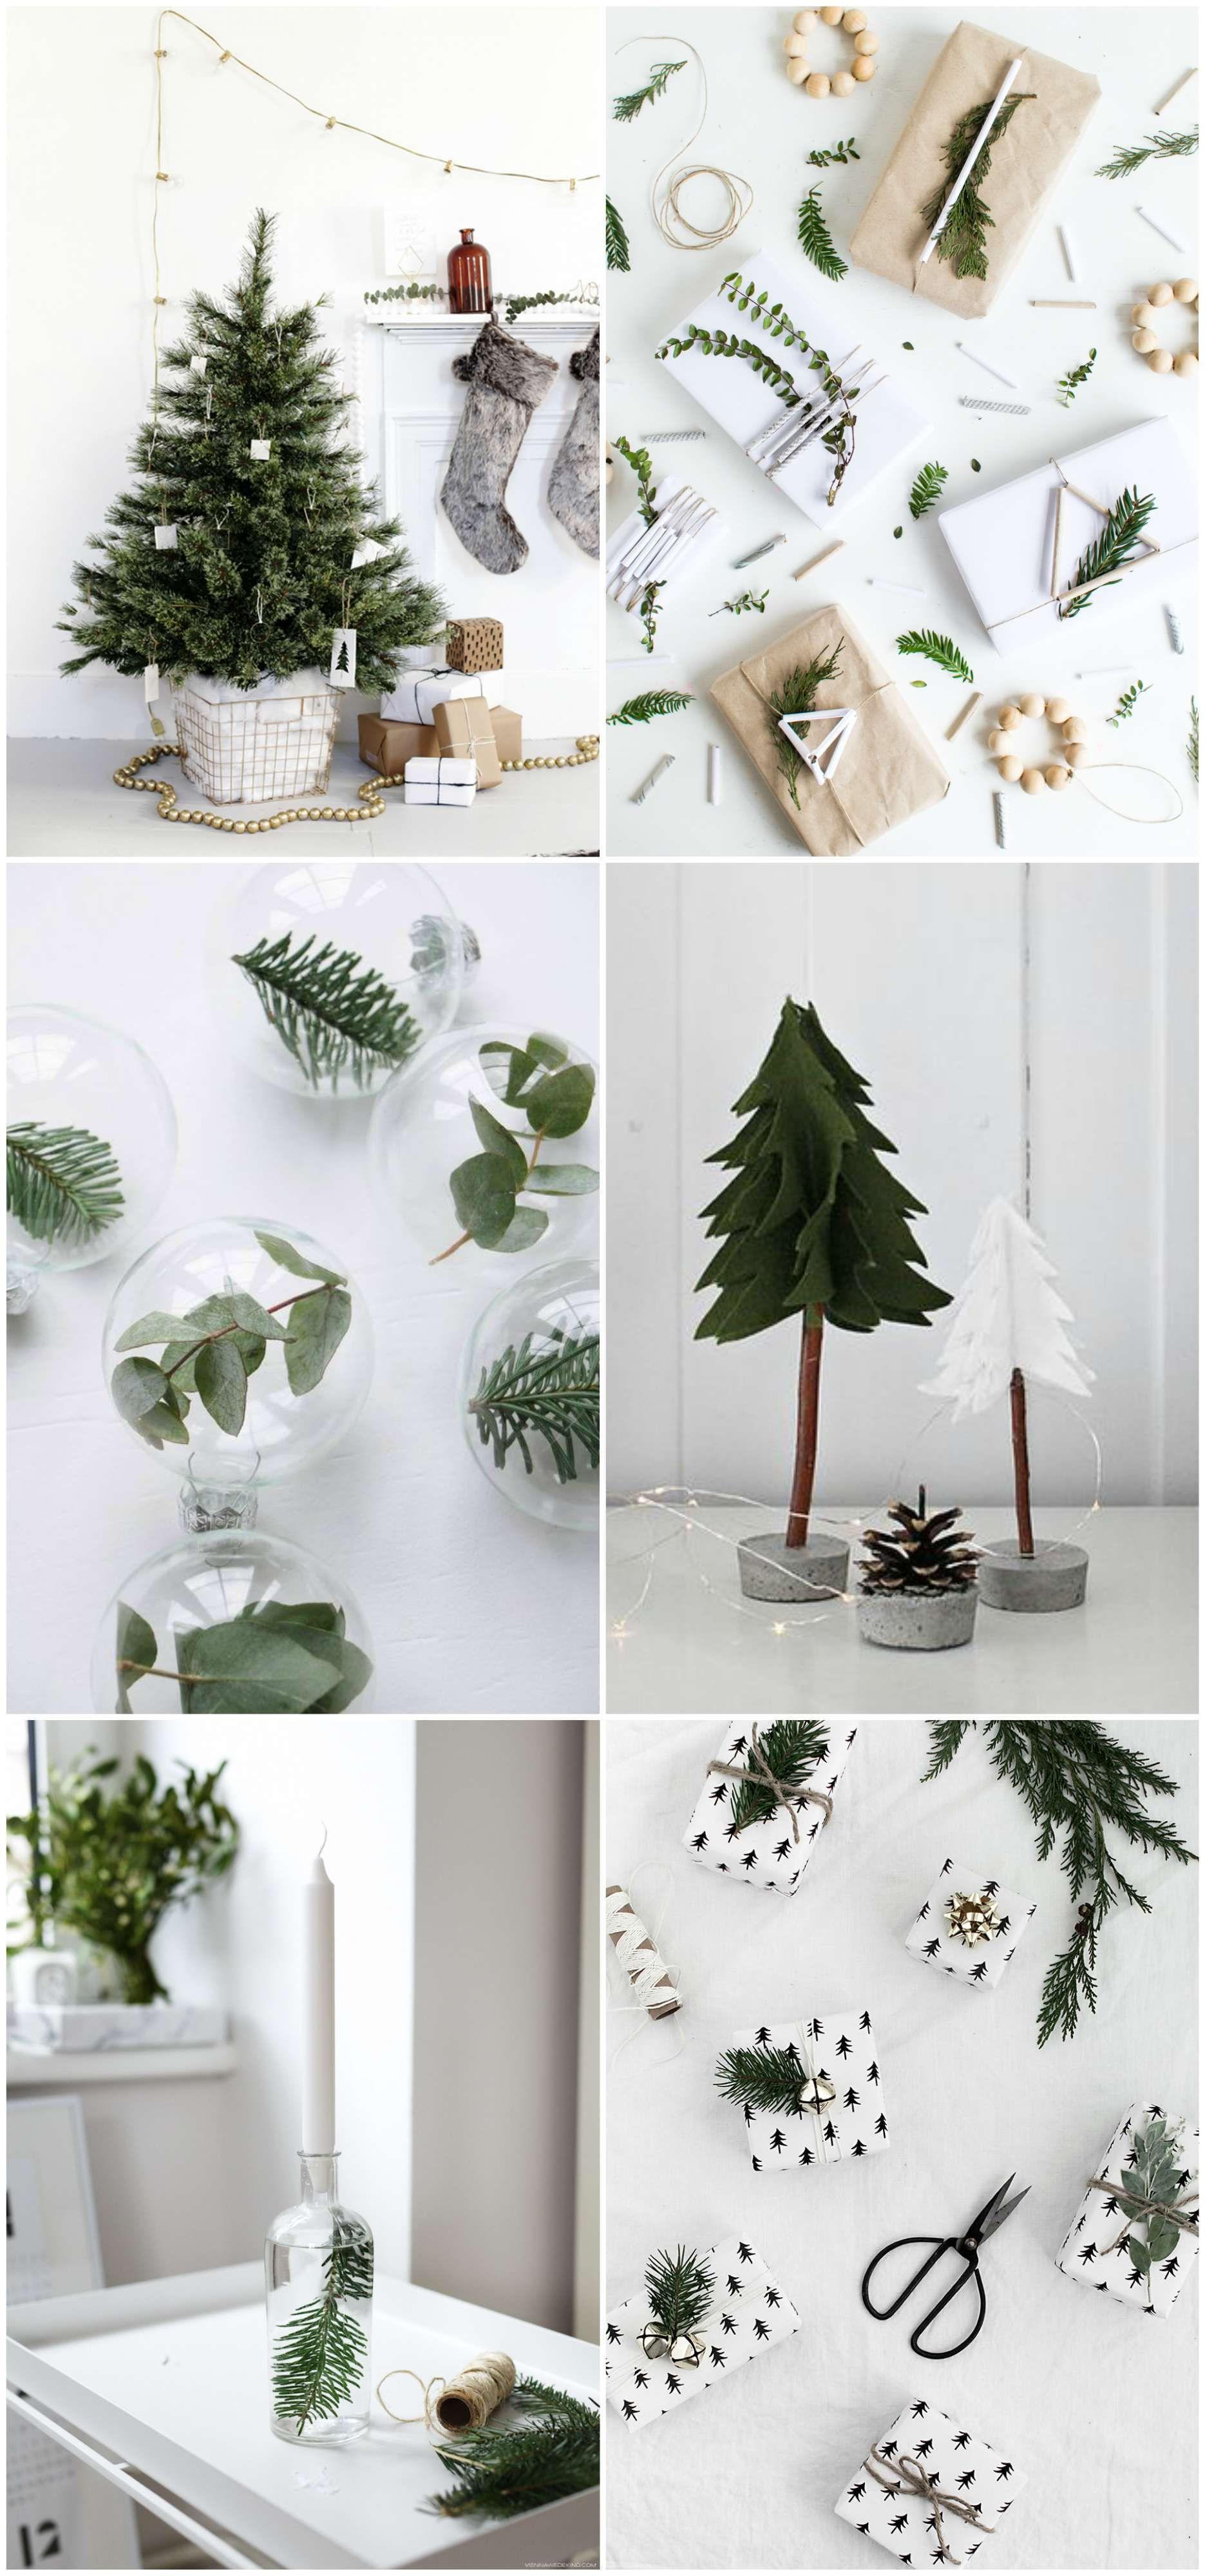 10 modern christmas diy projects christmas diy. Black Bedroom Furniture Sets. Home Design Ideas